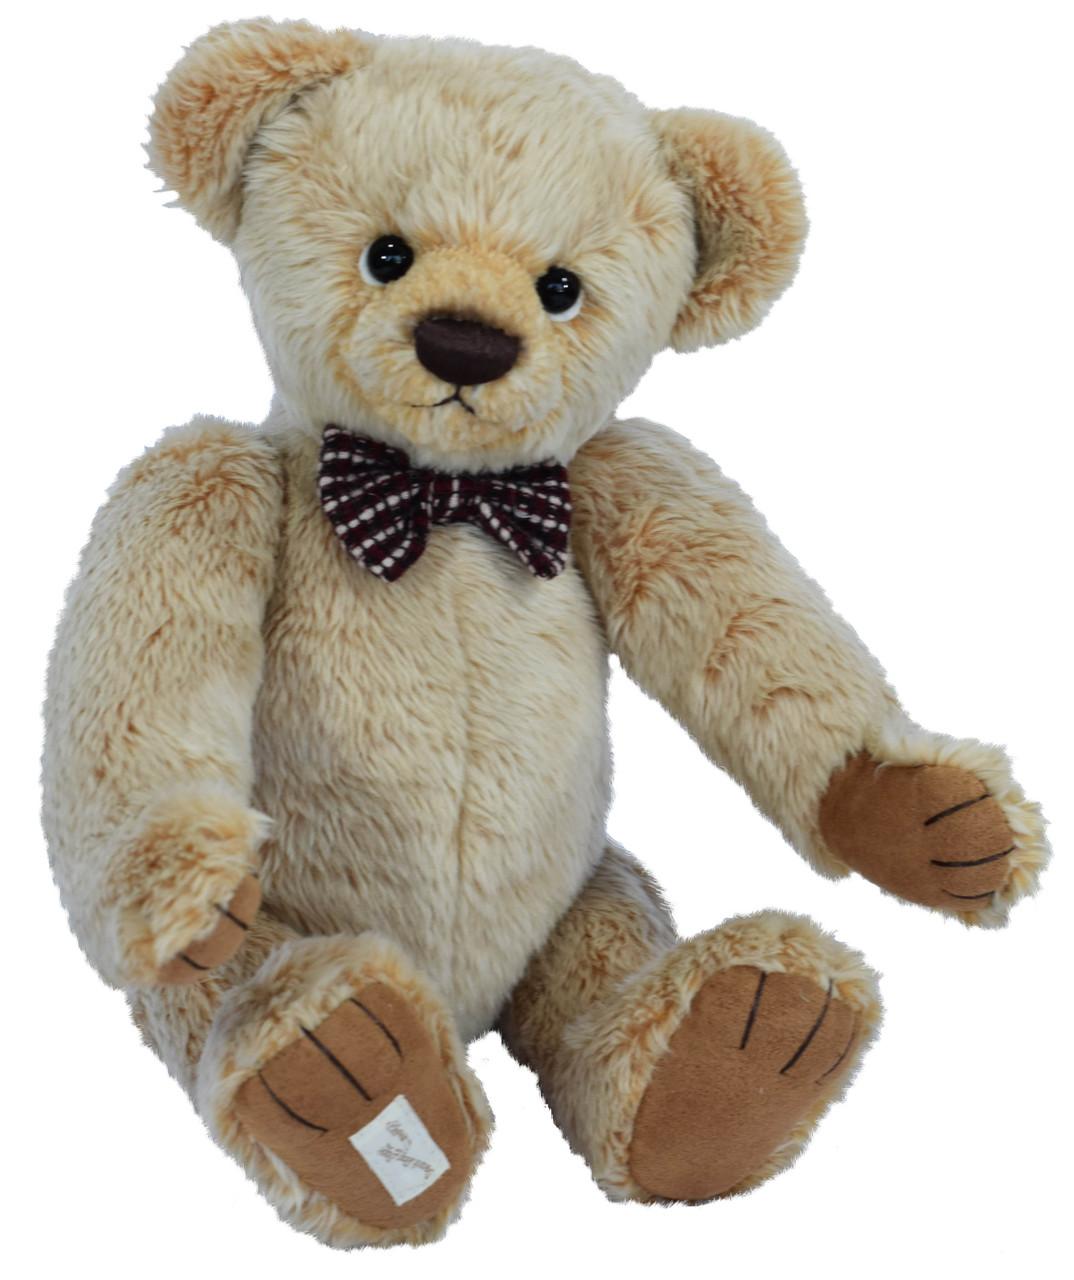 Barley Teddy Deans Teddy Bears UK Ltd Ed